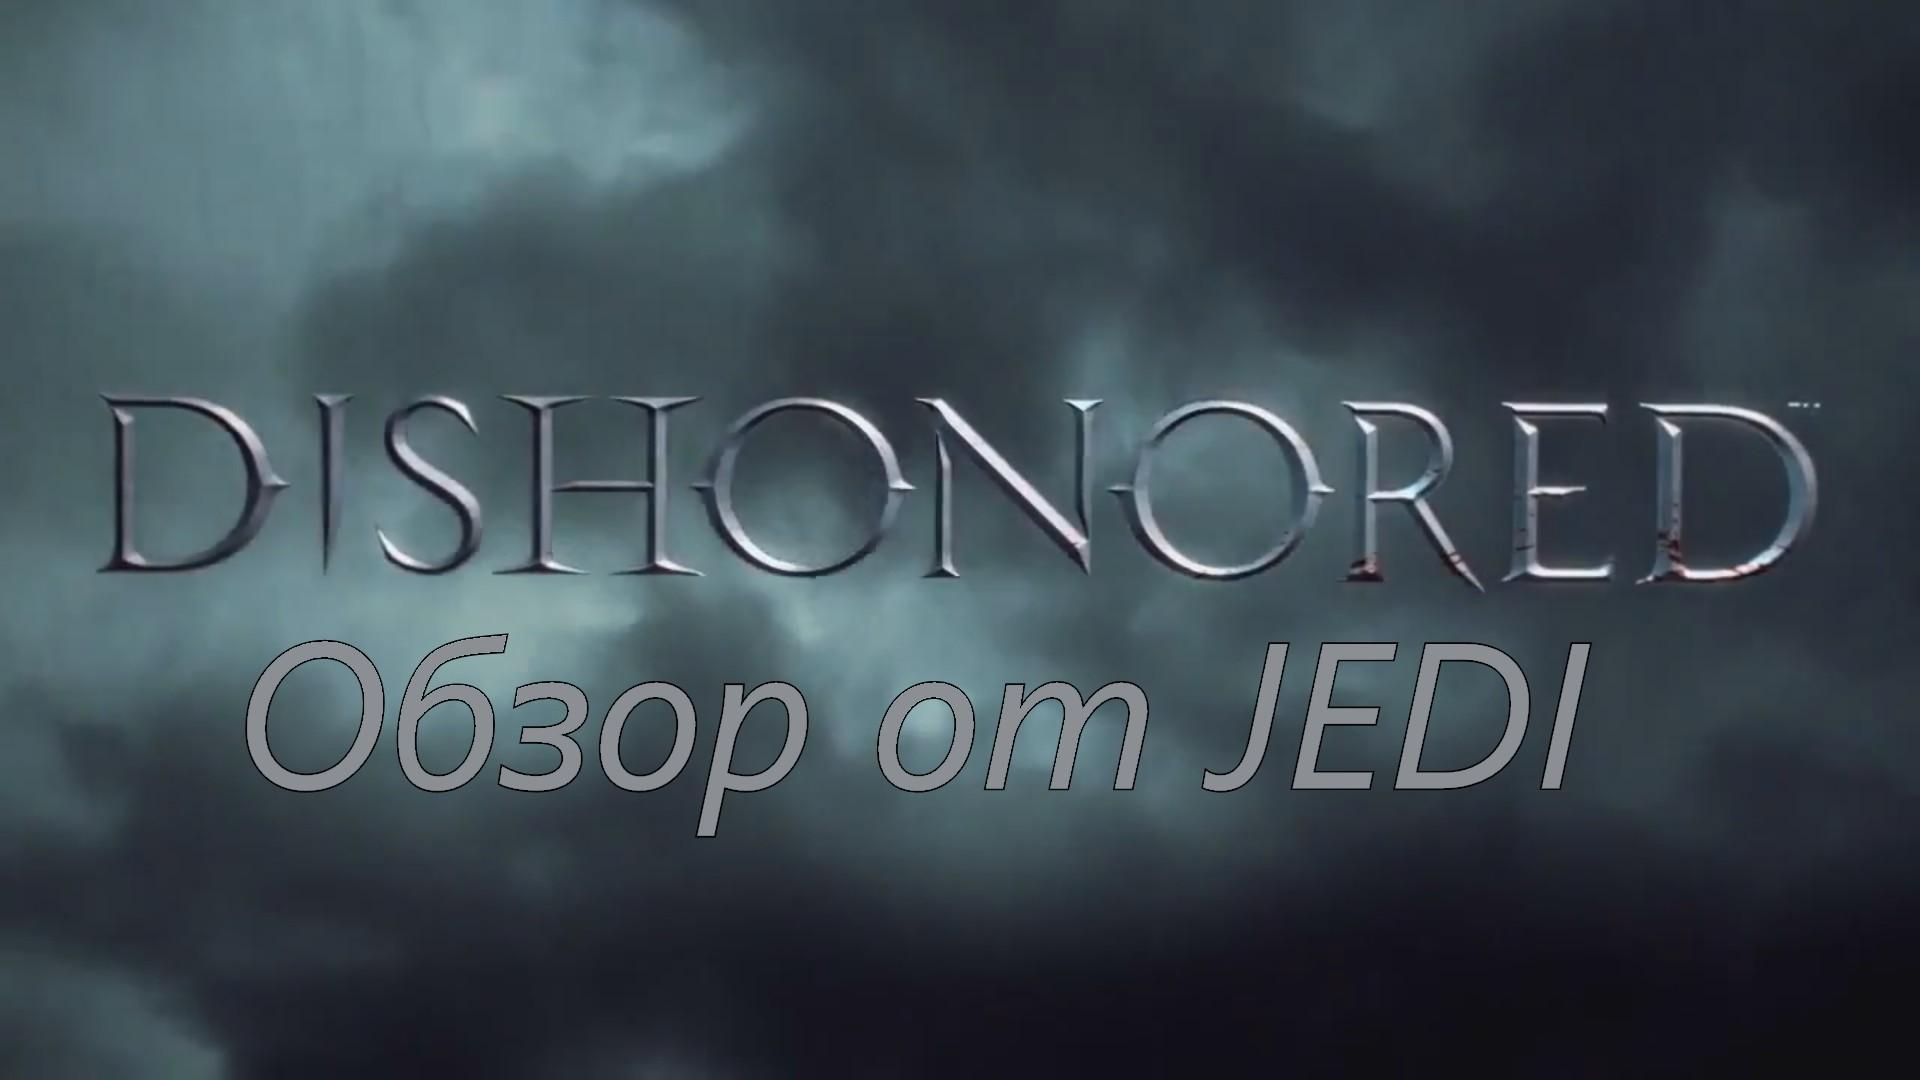 Dishonored. Обзор от JEDI